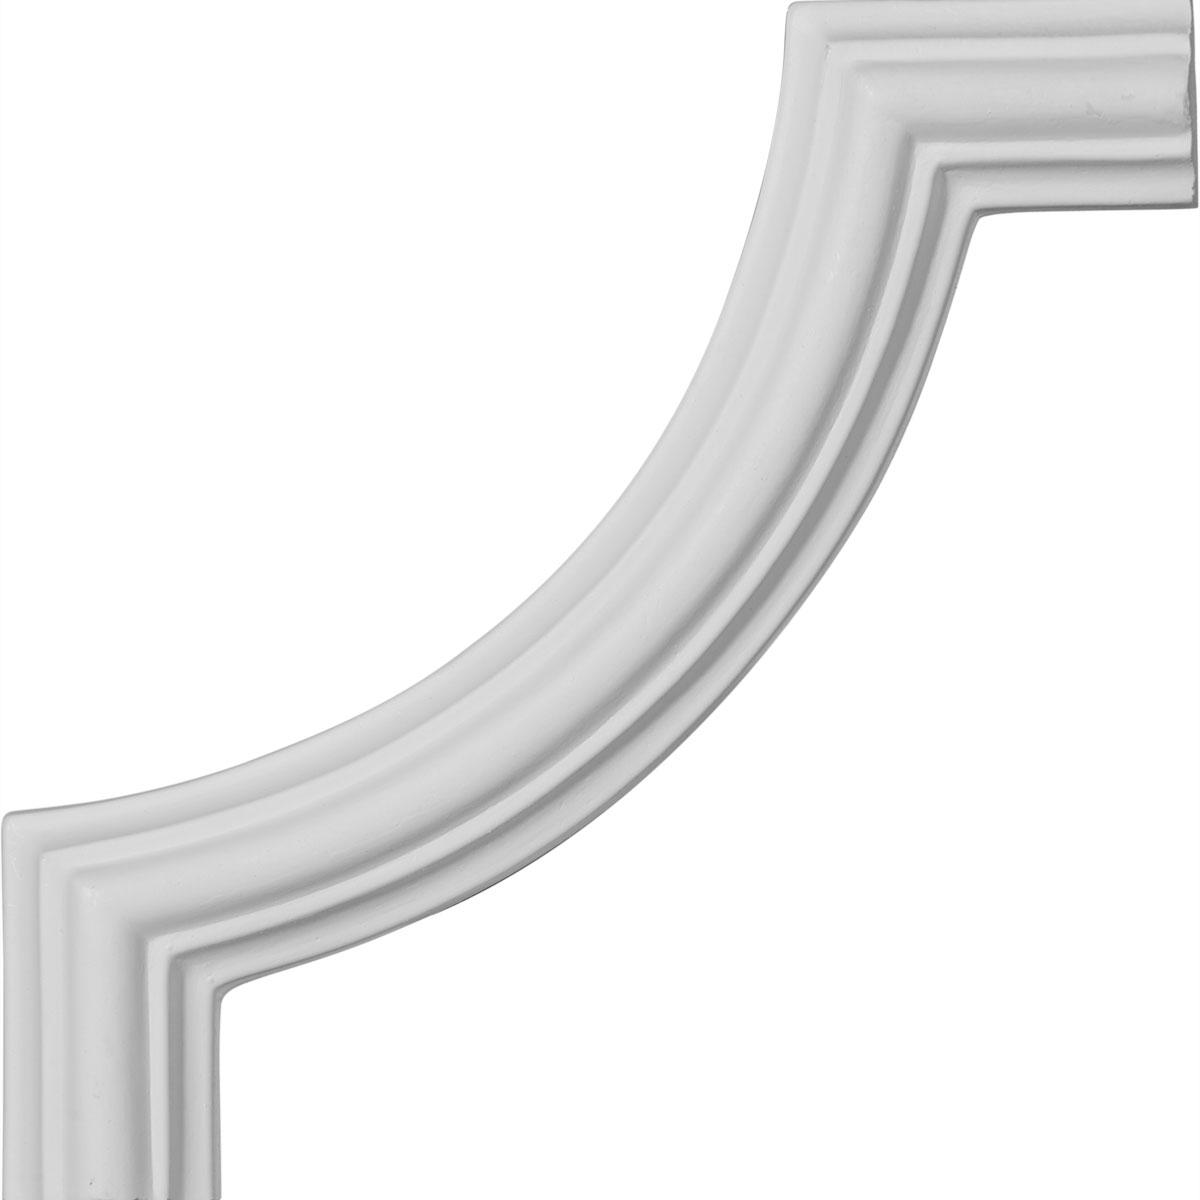 Ekena Millwork Polyurethane Panel Moulding Corner 3in